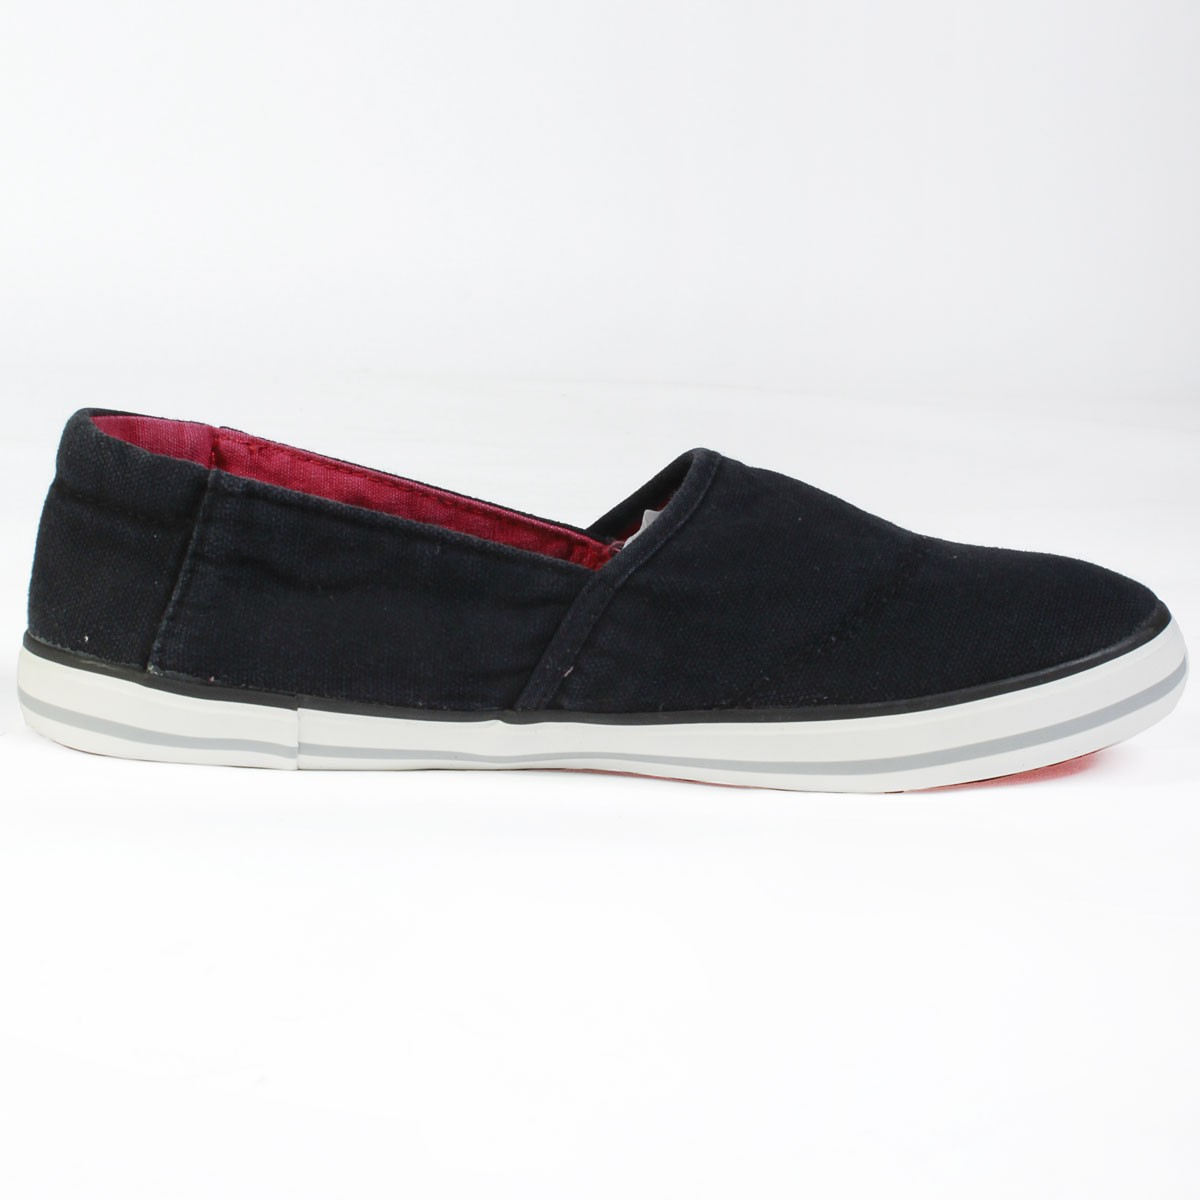 Mens-Voi-Jeans-Plimsolls-Sundance-Slip-On-Espadrilles-With-V-Logo-Shoe-Plimsole